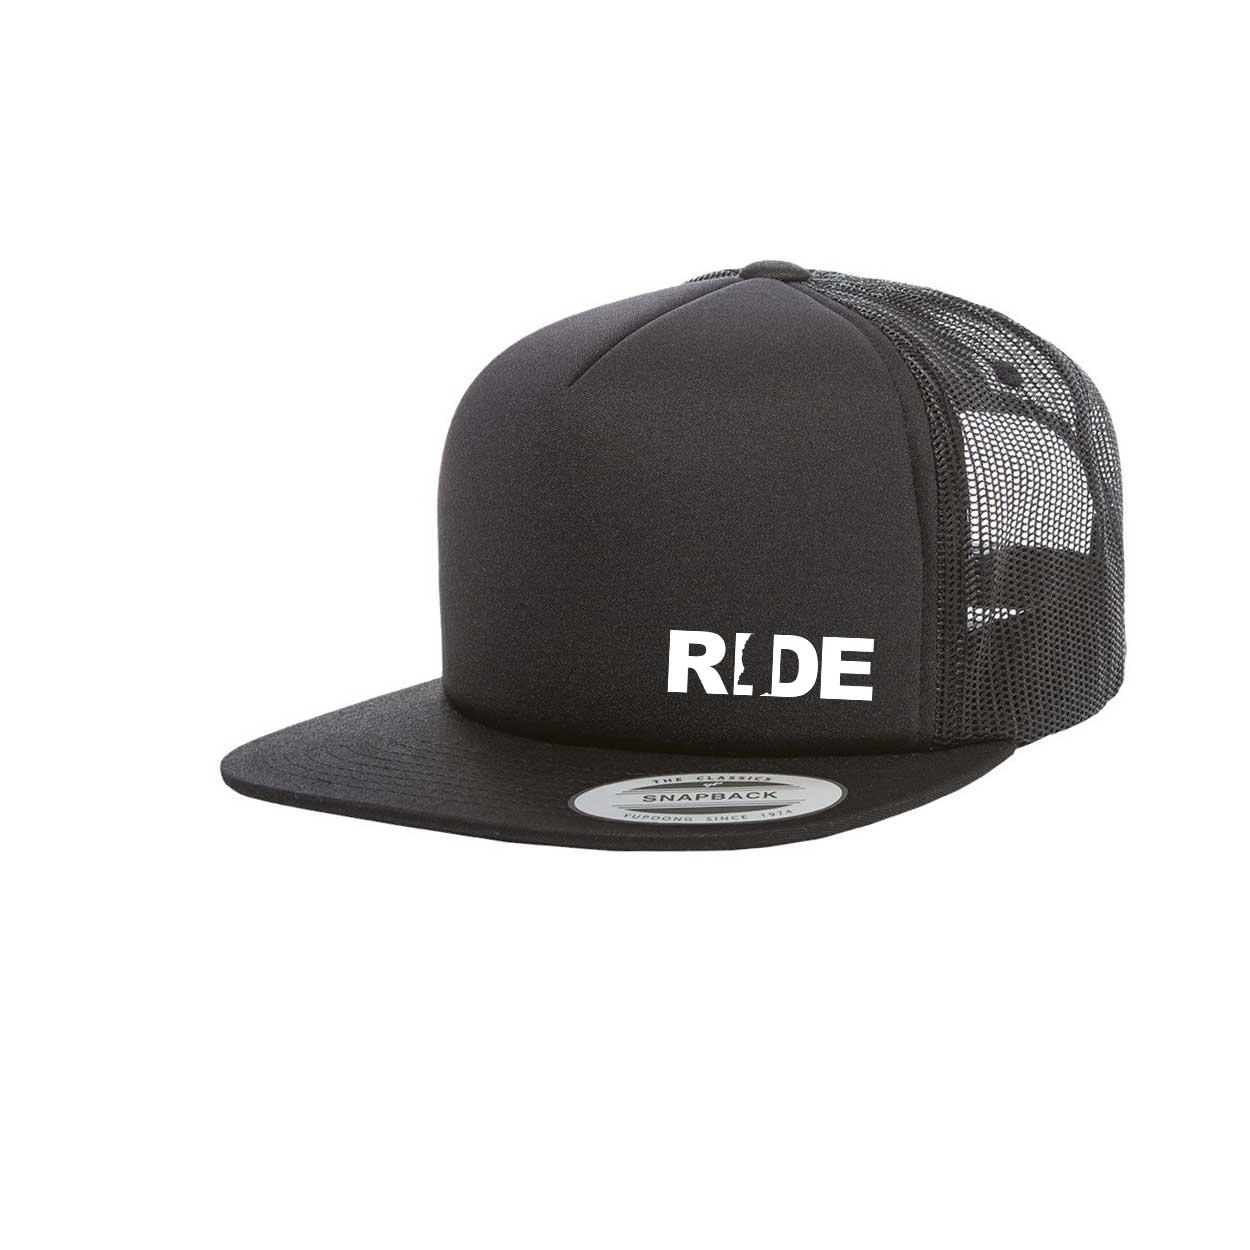 Ride Mississippi Night Out Premium Foam Flat Brim Snapback Hat Black (White Logo)